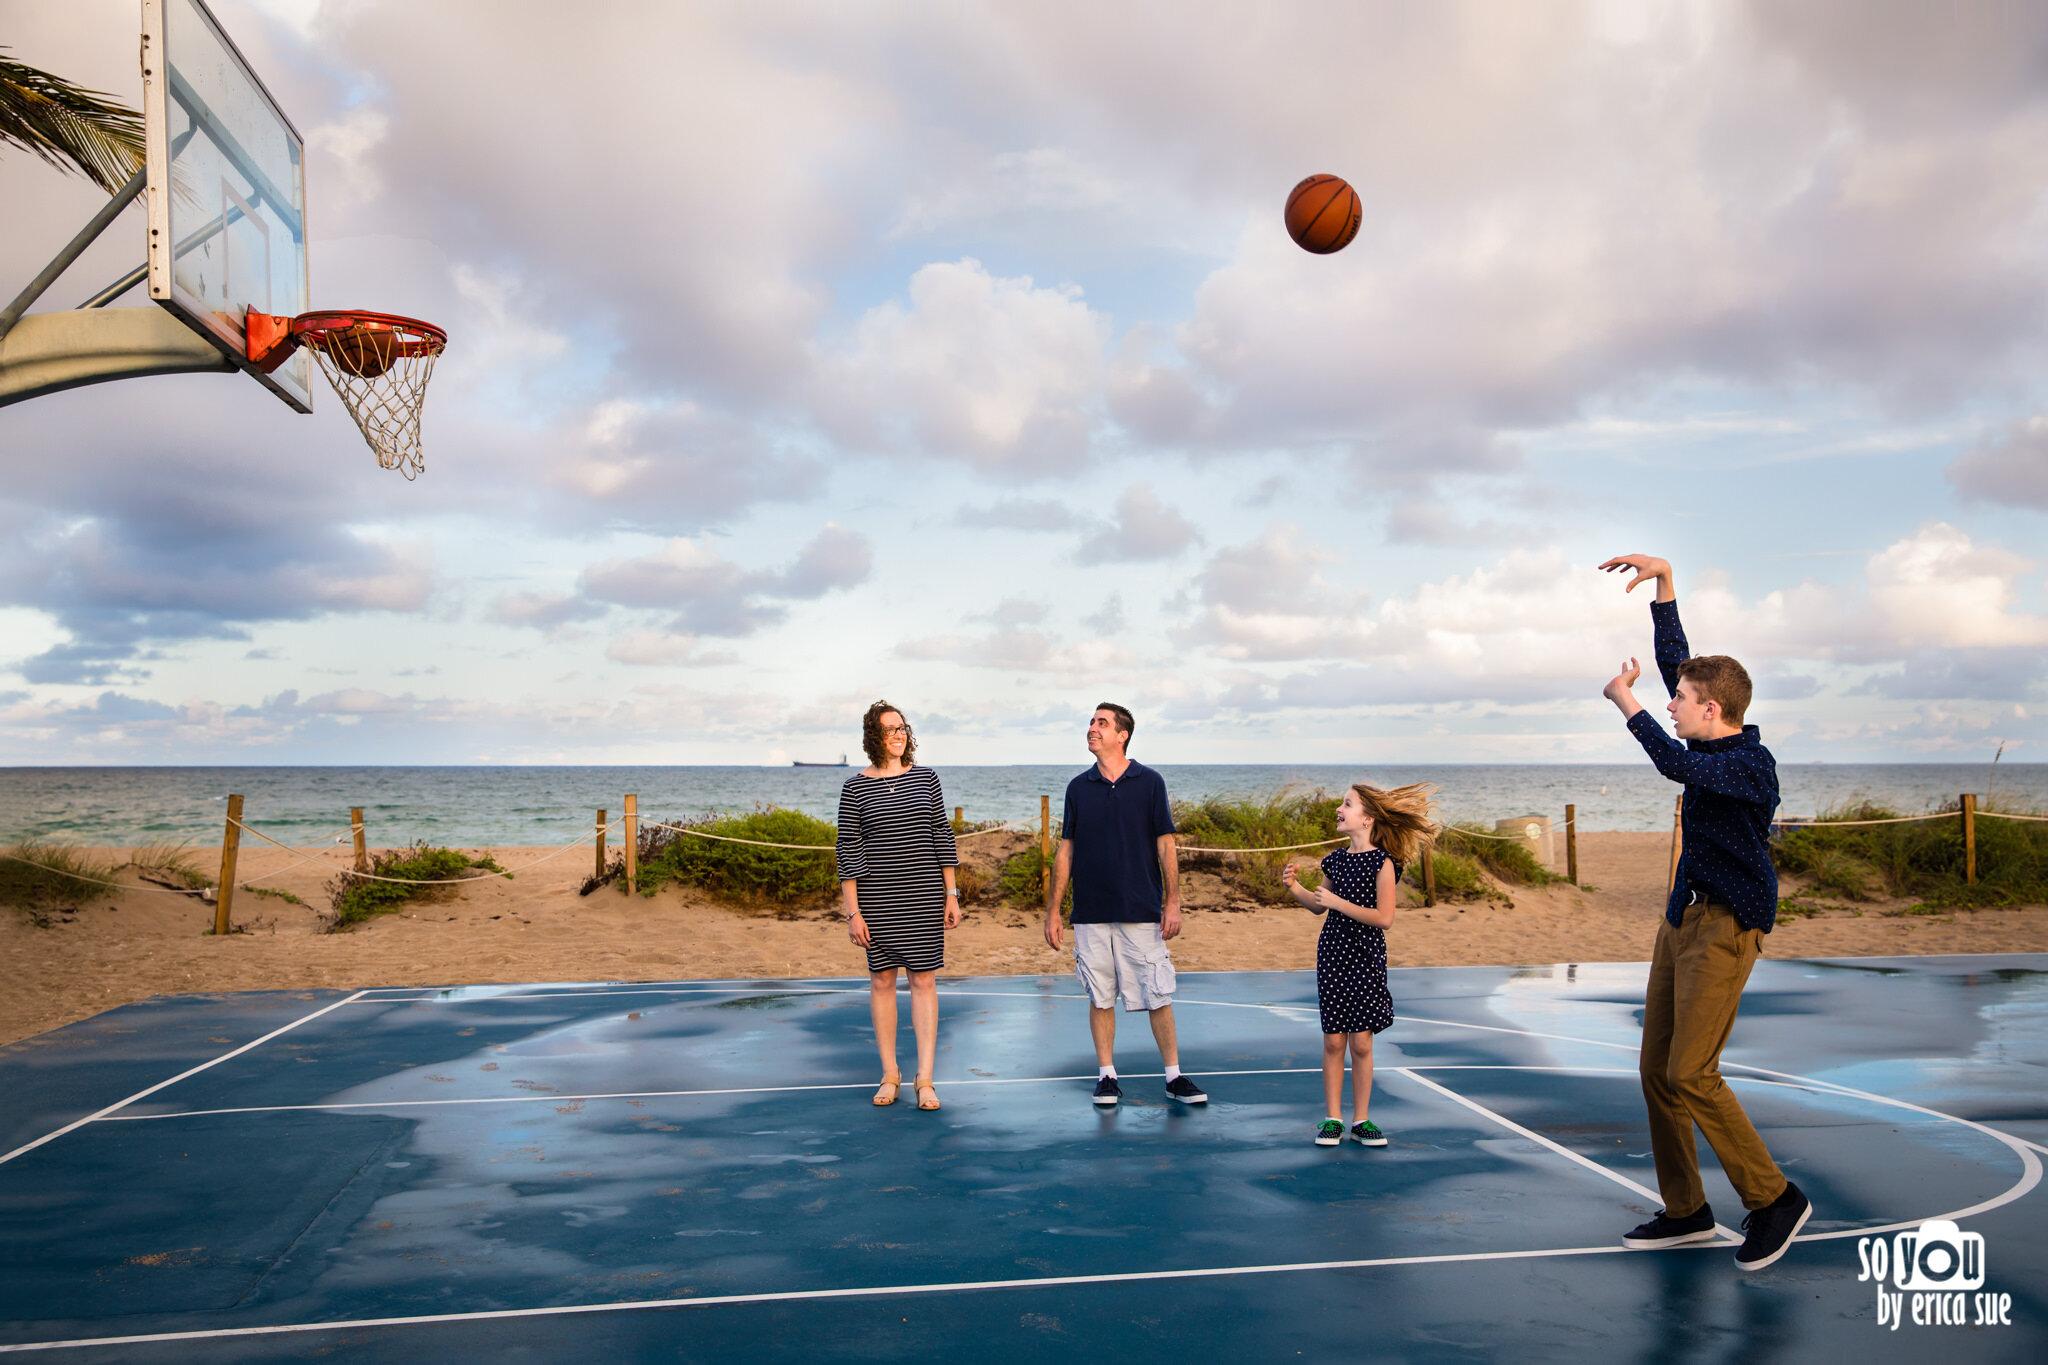 so-you-by-erica-sue-ft-lauderdale-beach-basketball-mitzvah-pre-shoot--3.JPG